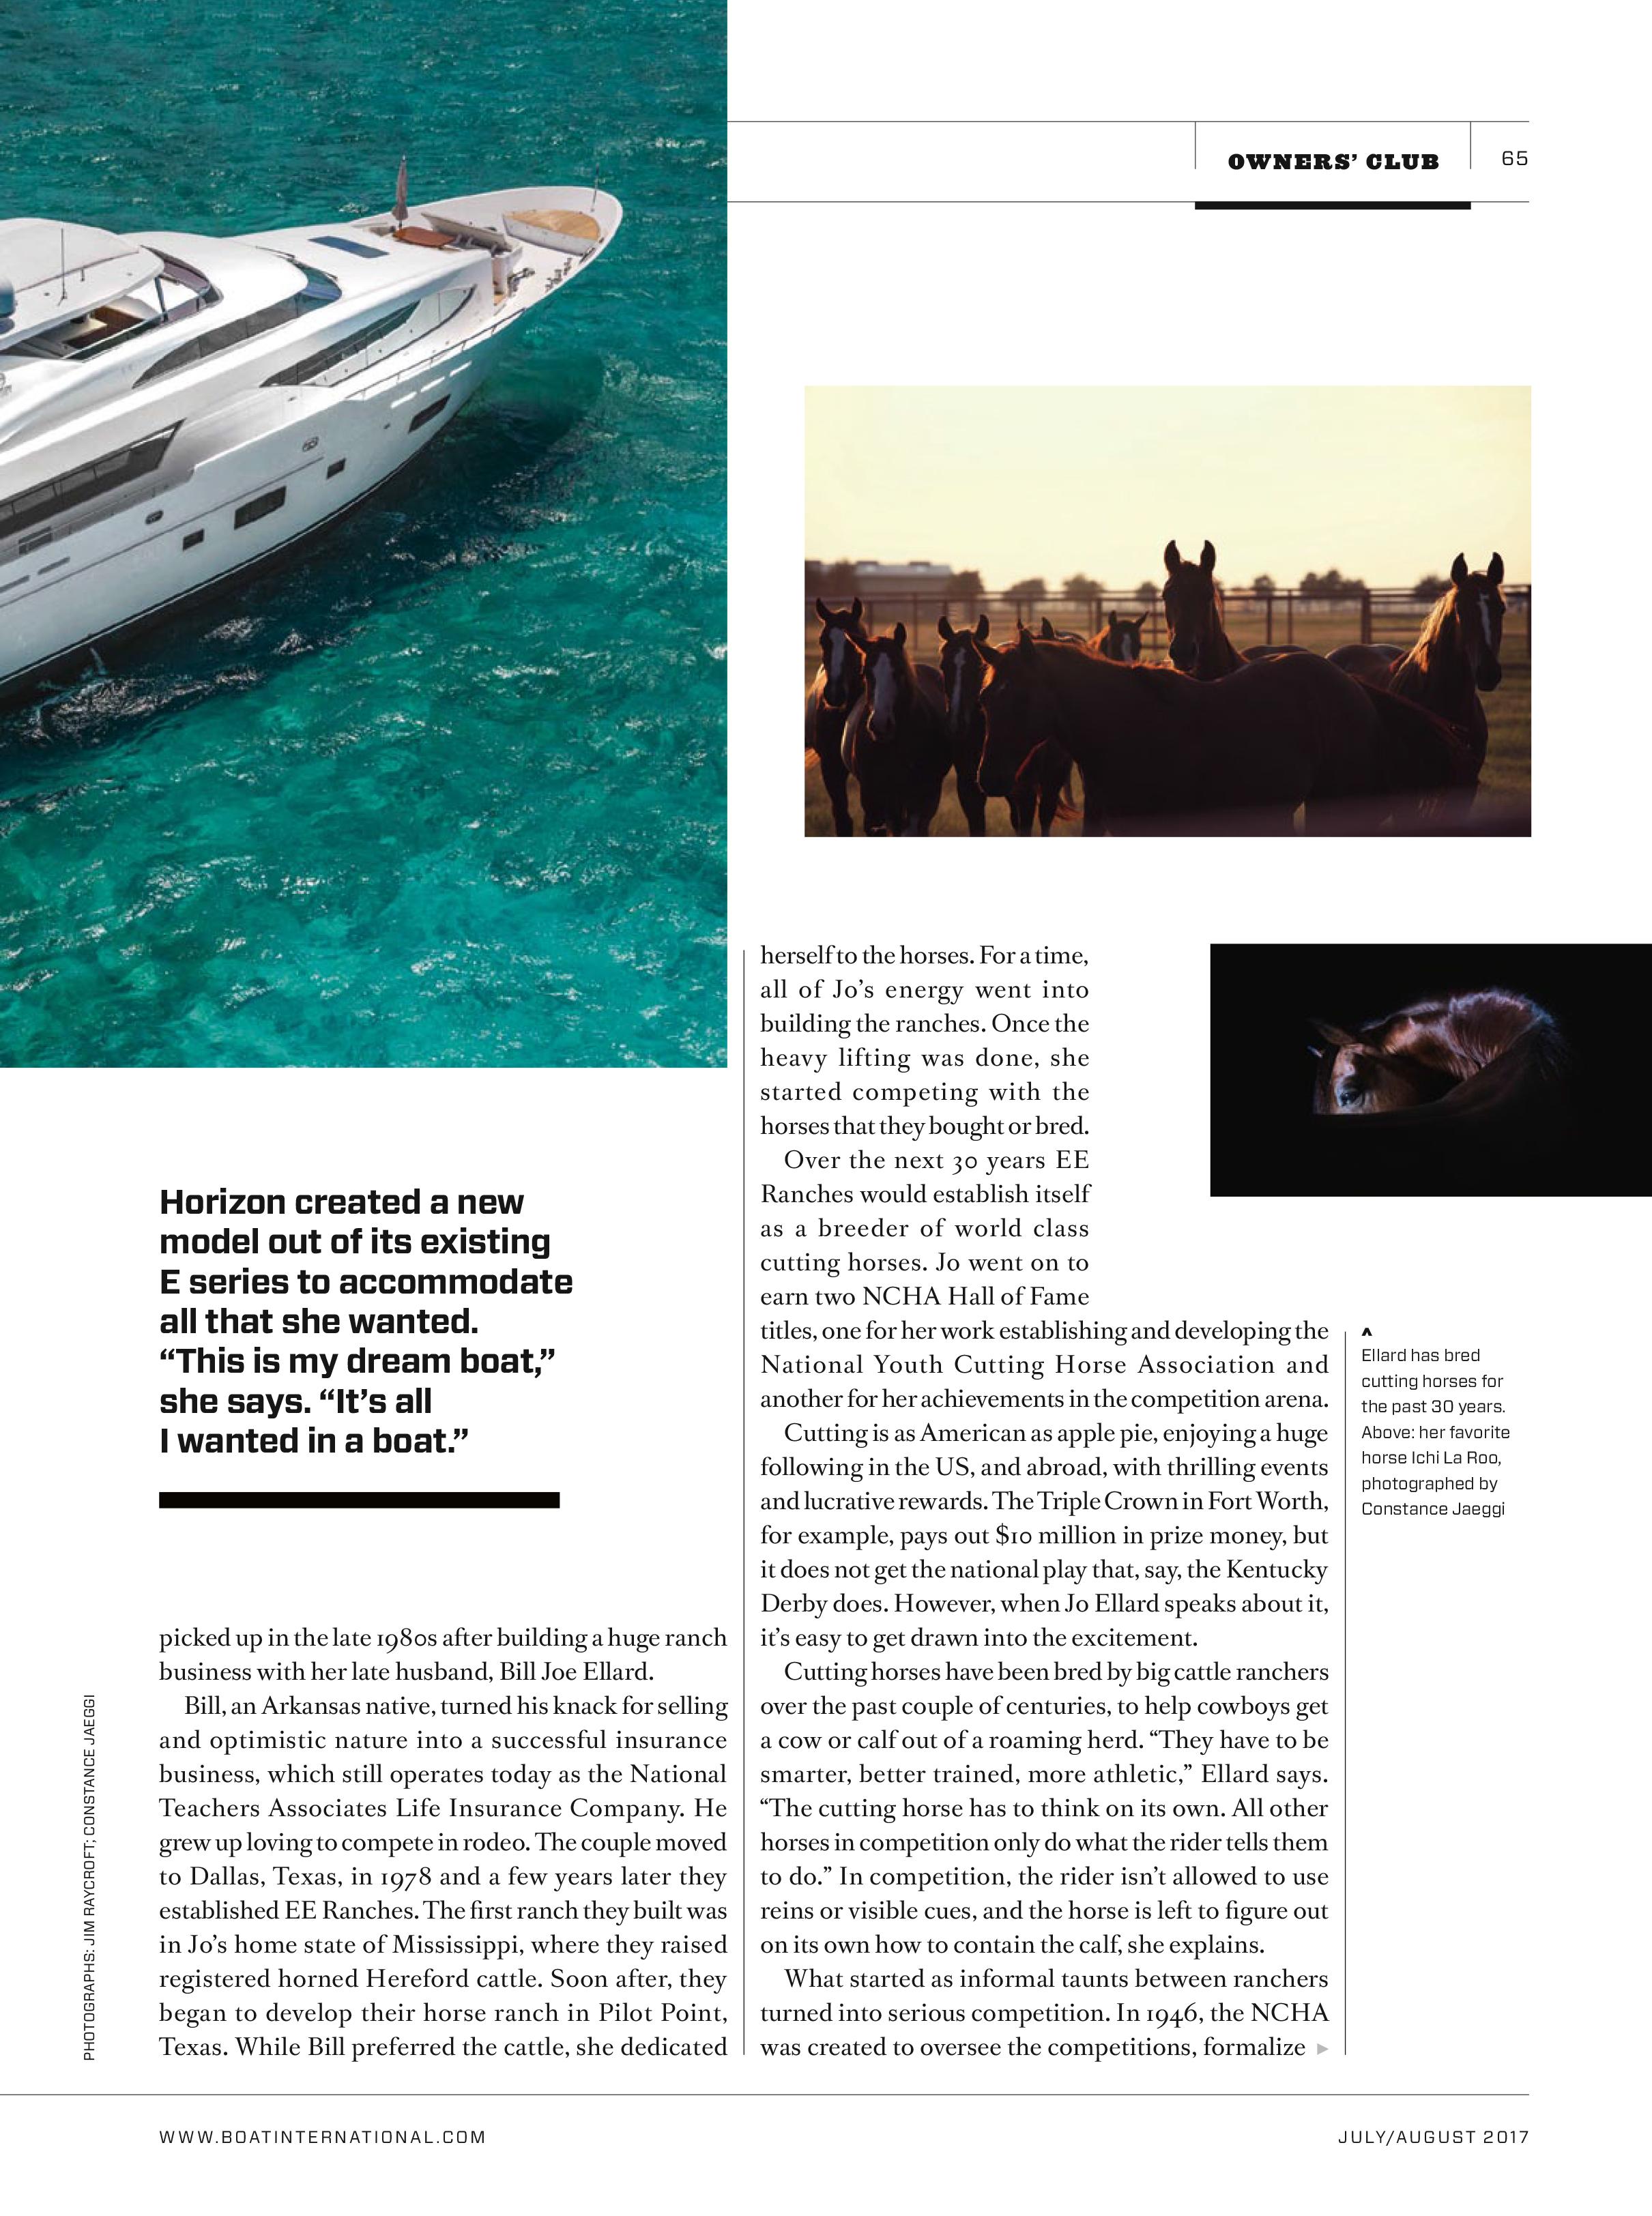 Boat-International-US-Edition-JulyAugust-2017-FreeMags-68.jpg